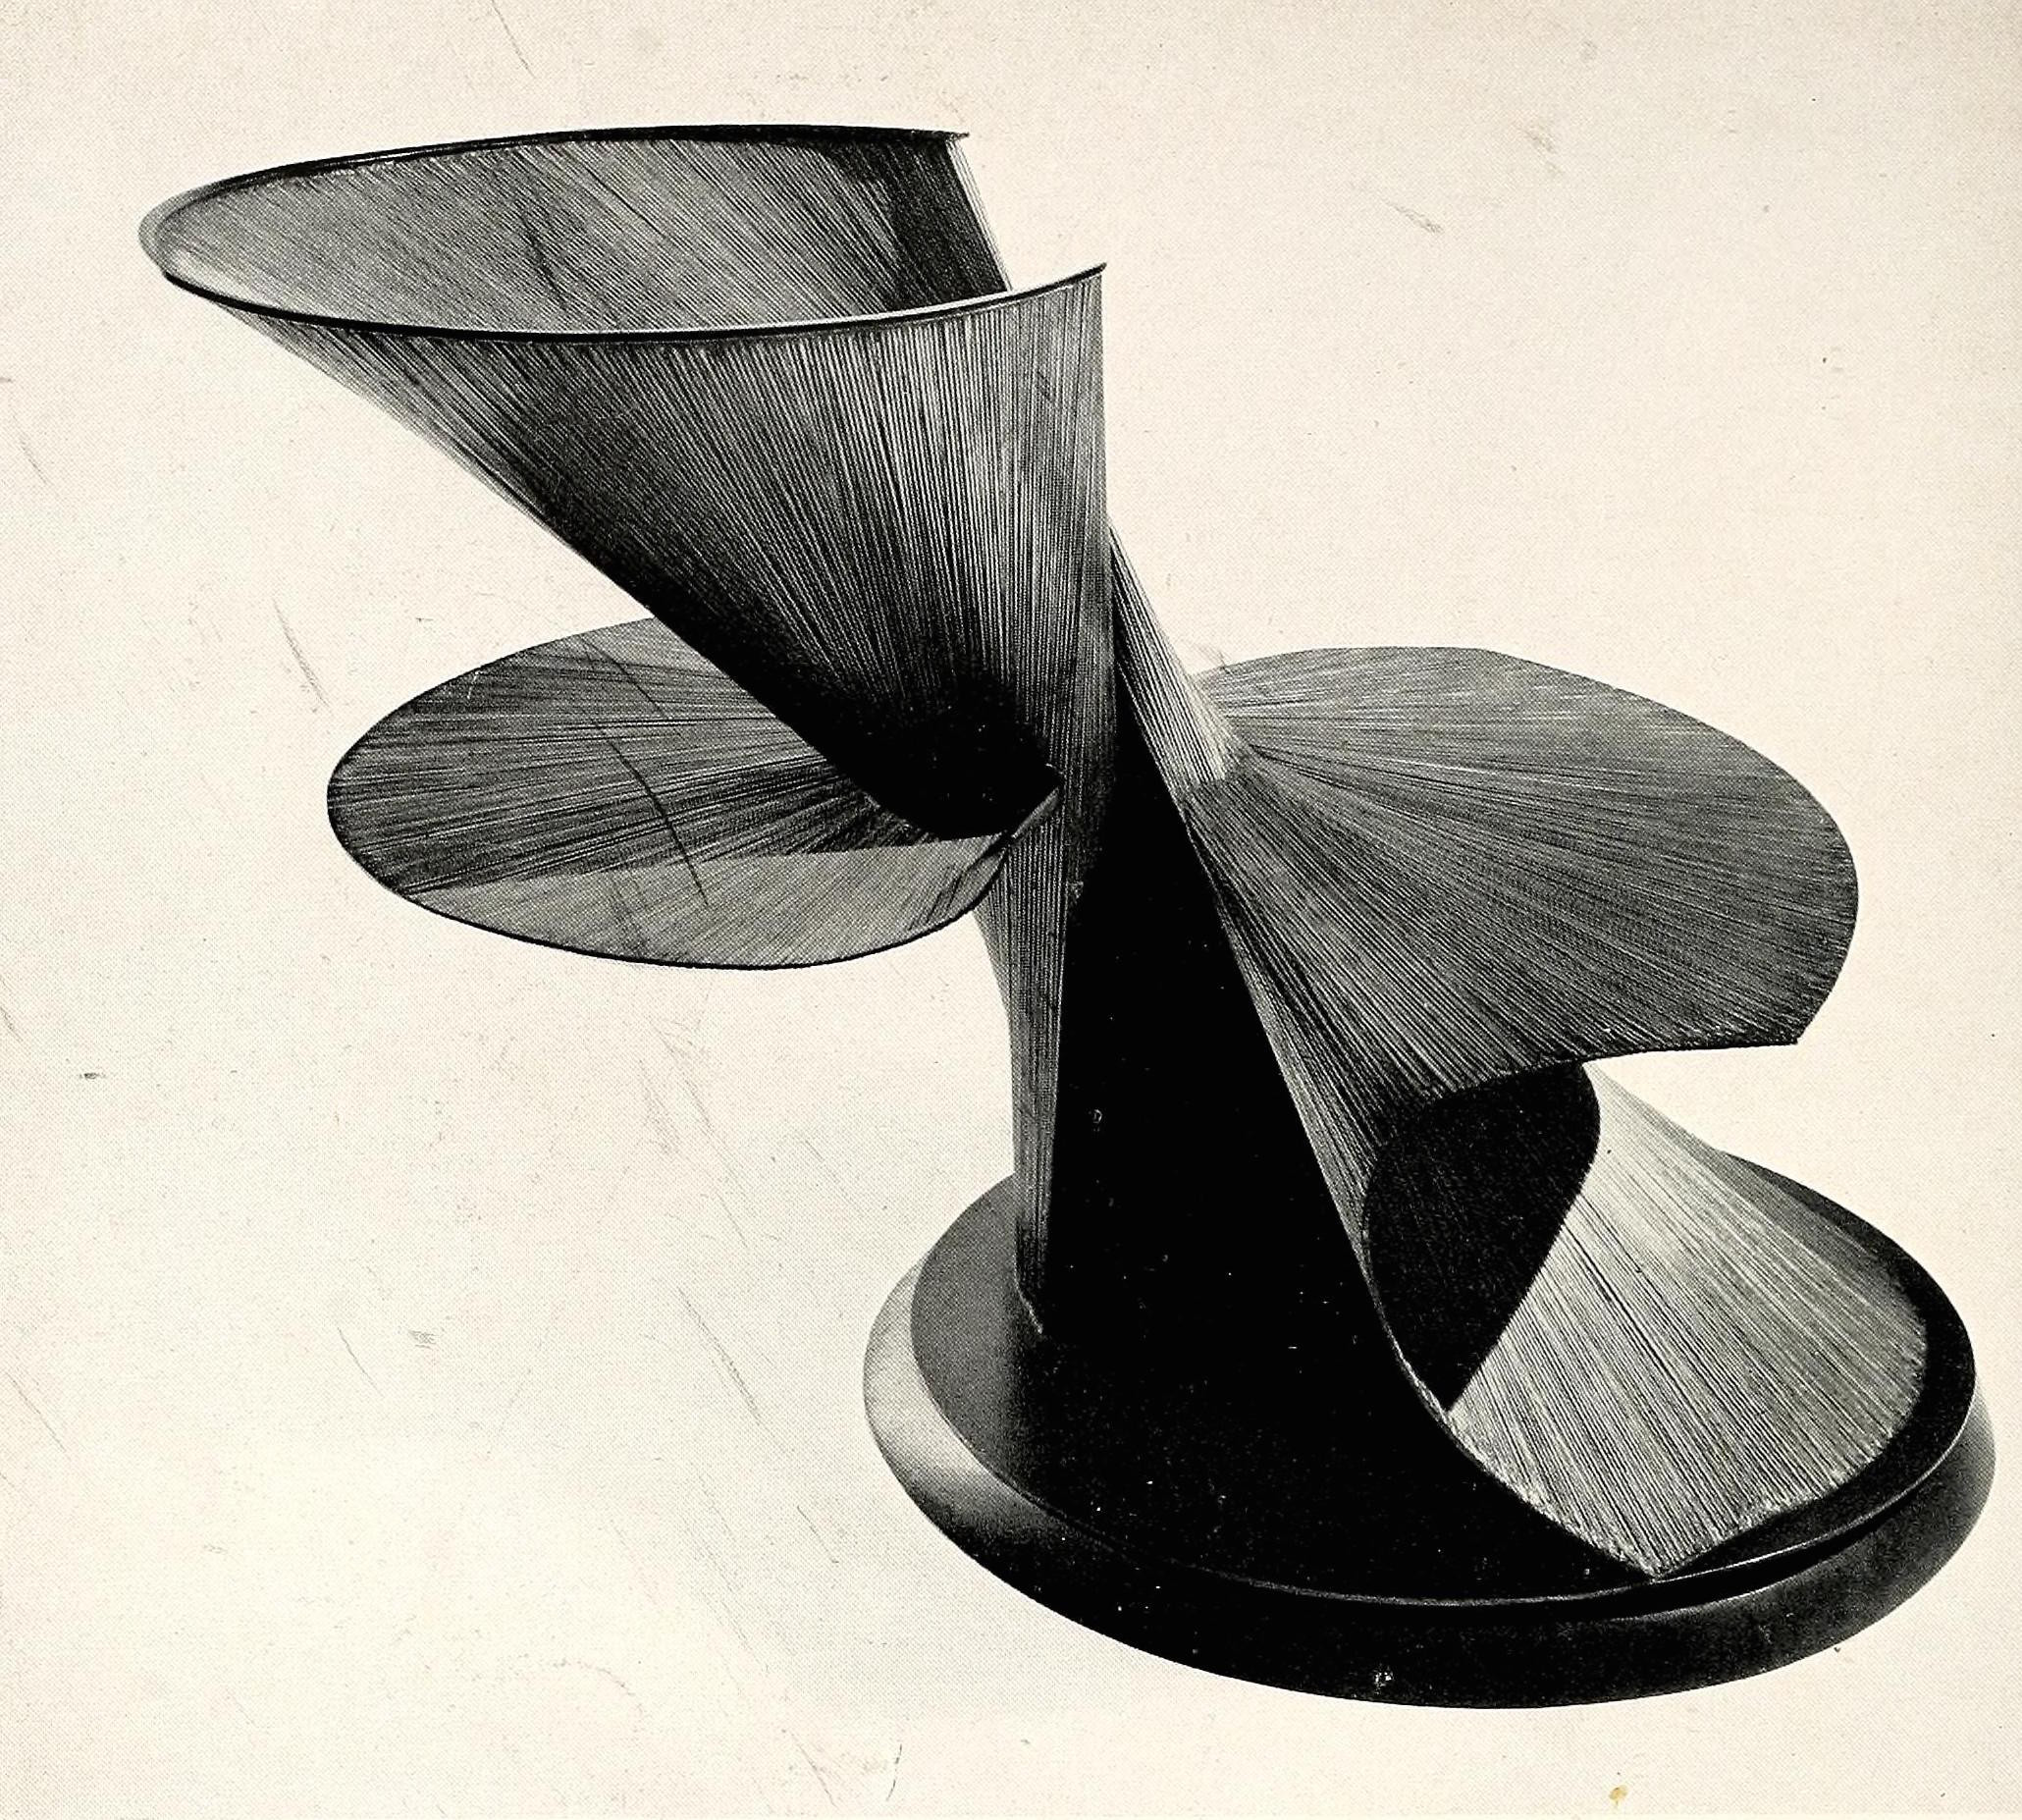 "Antoine Pevsner, developable column (1942), oxidized tin on brass, 20"" high"